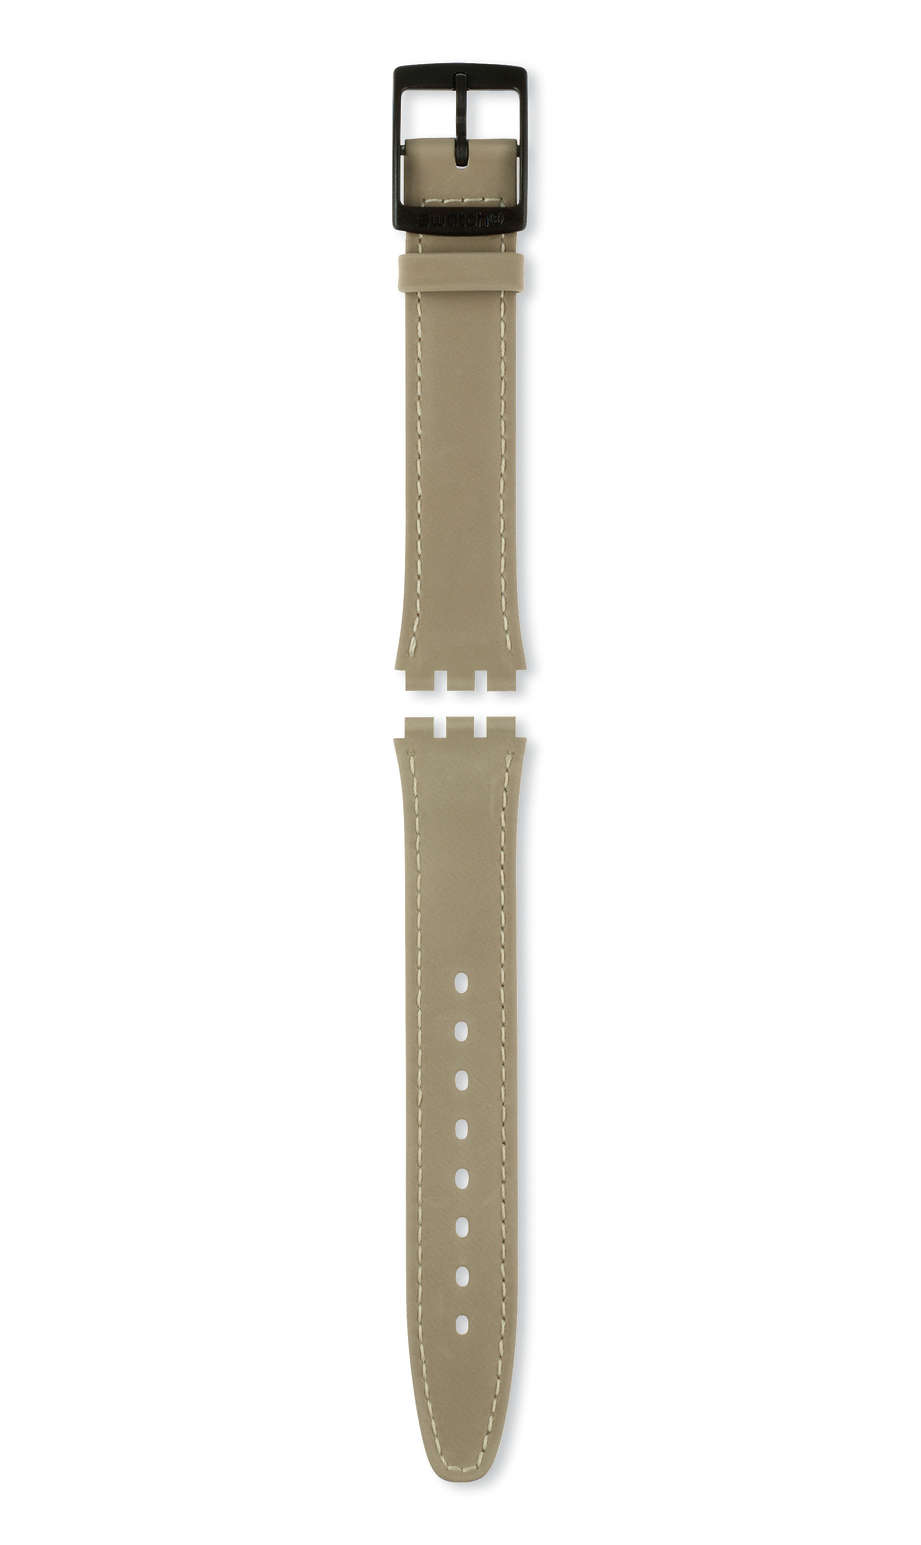 Swatch - DESERTIC - 1